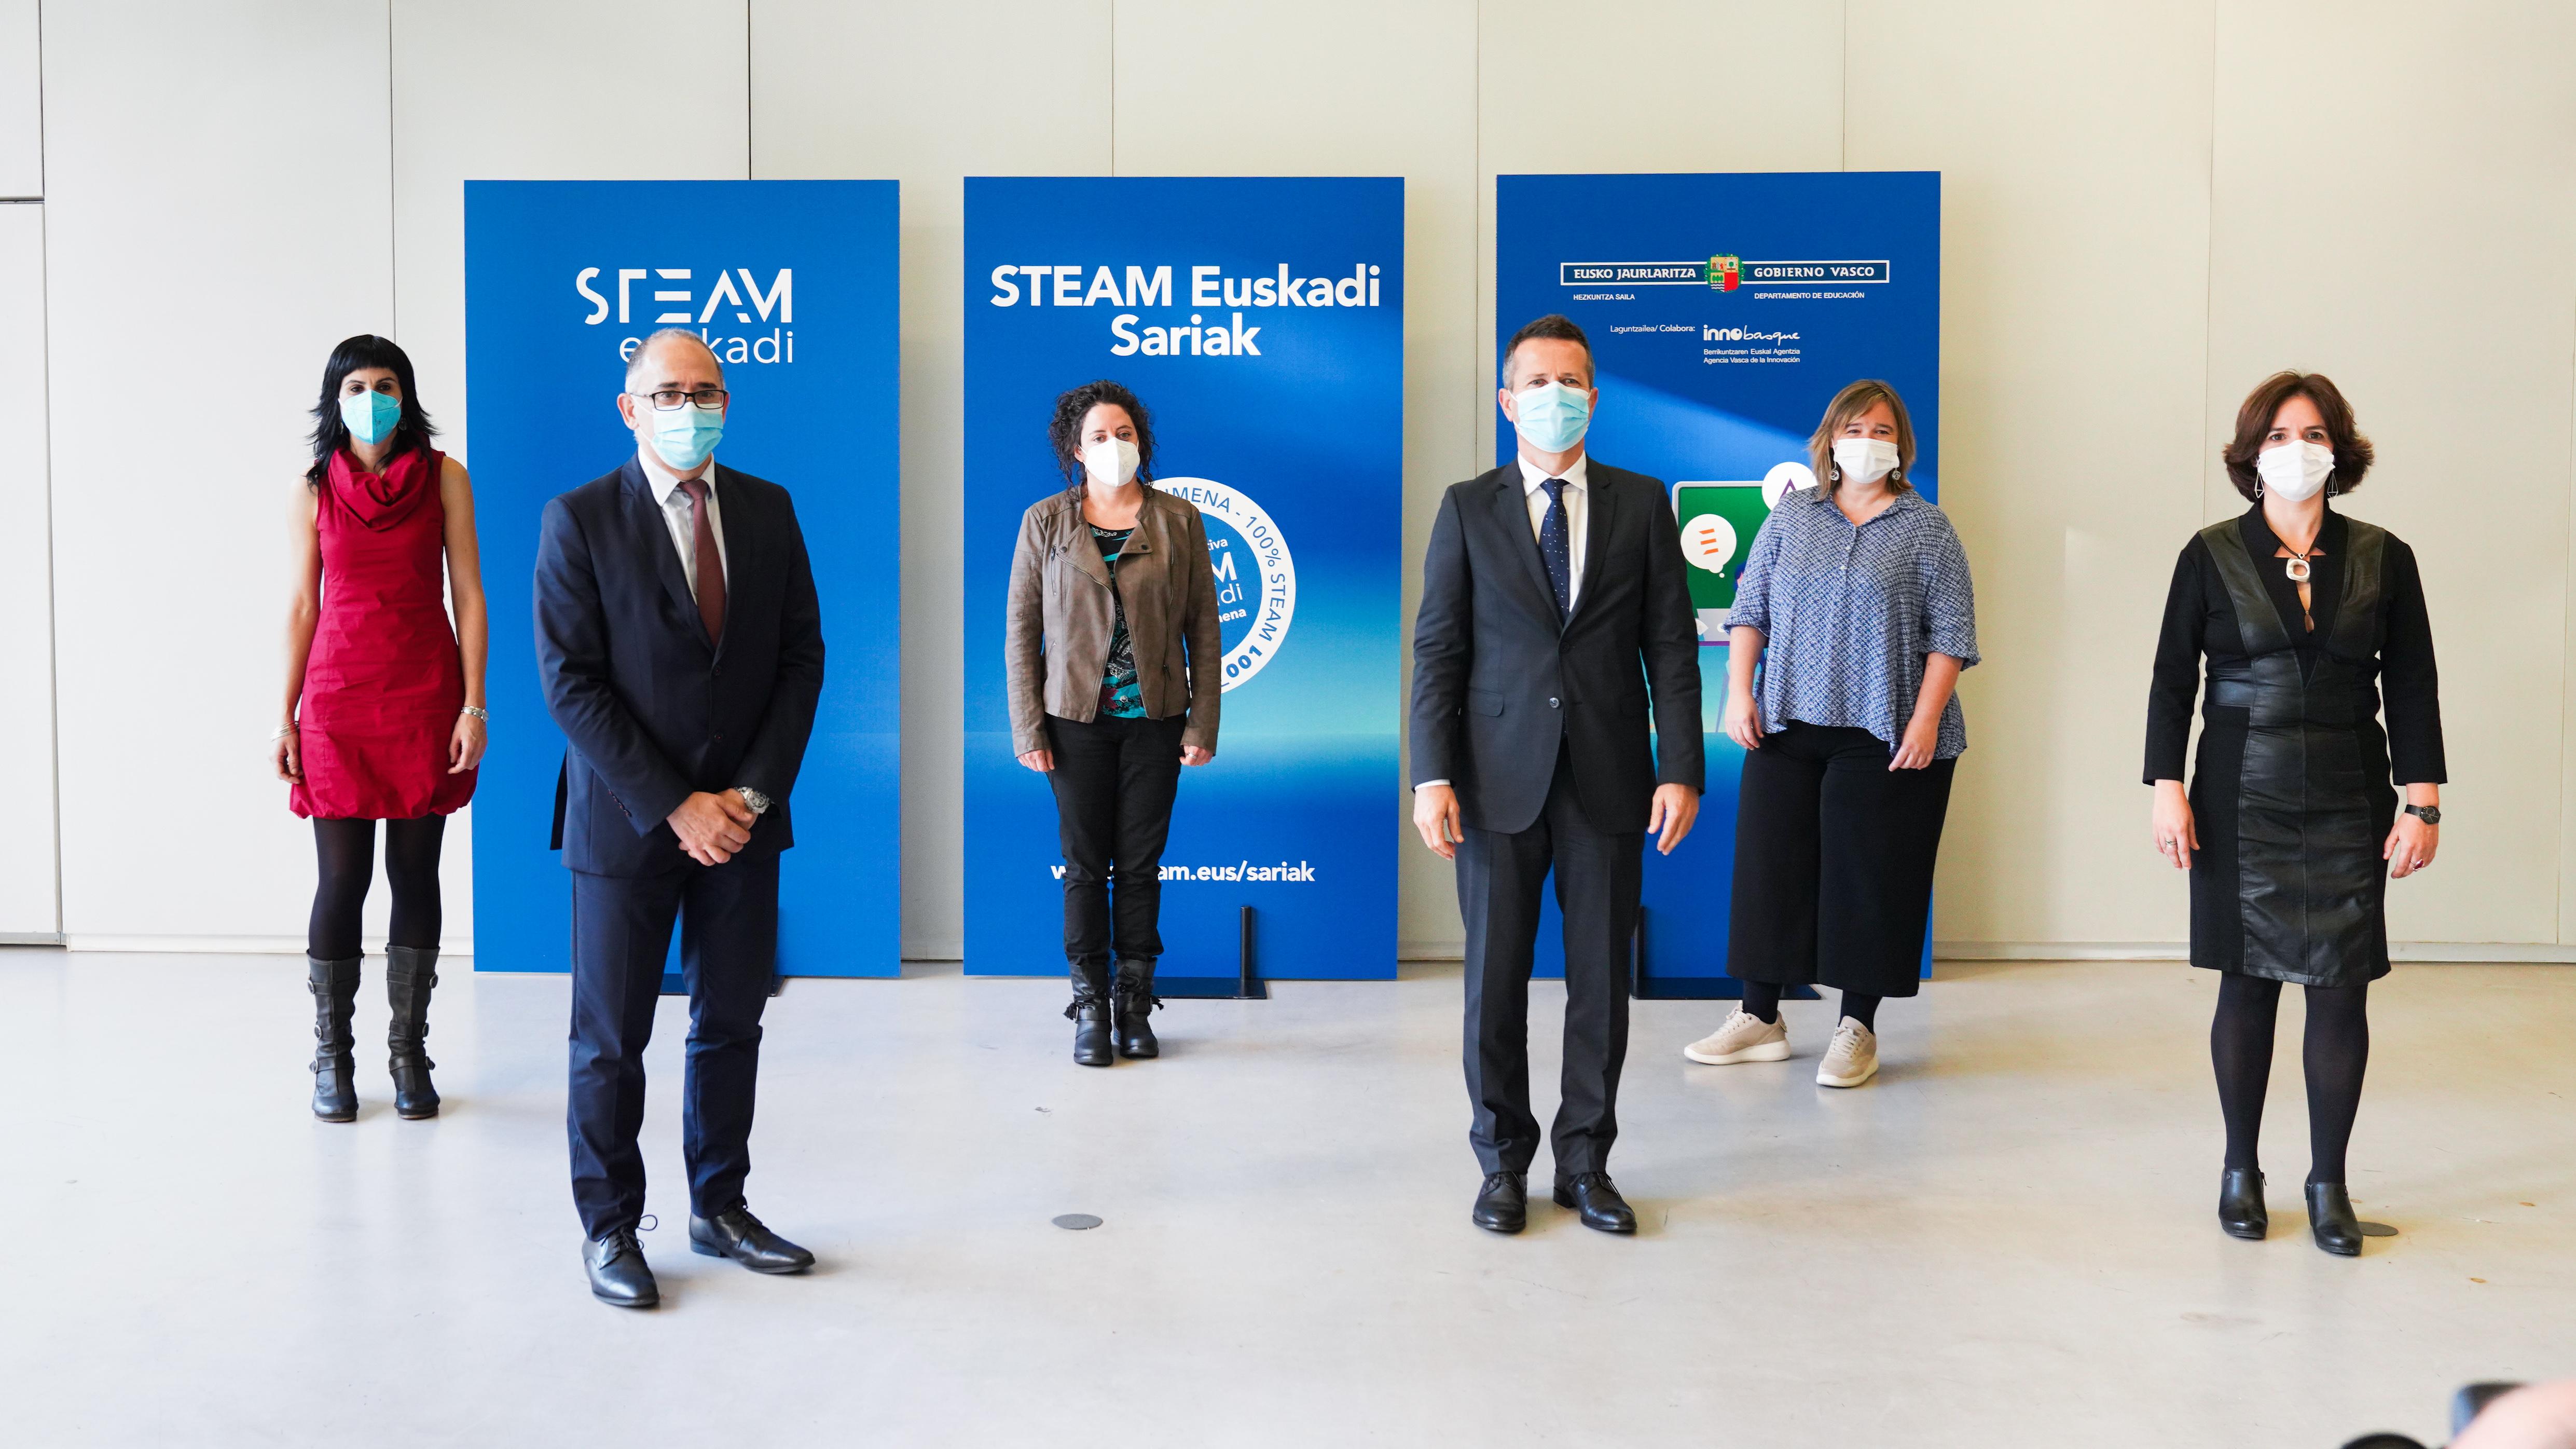 STEAM_Euskadi_Sariak__1_.jpg